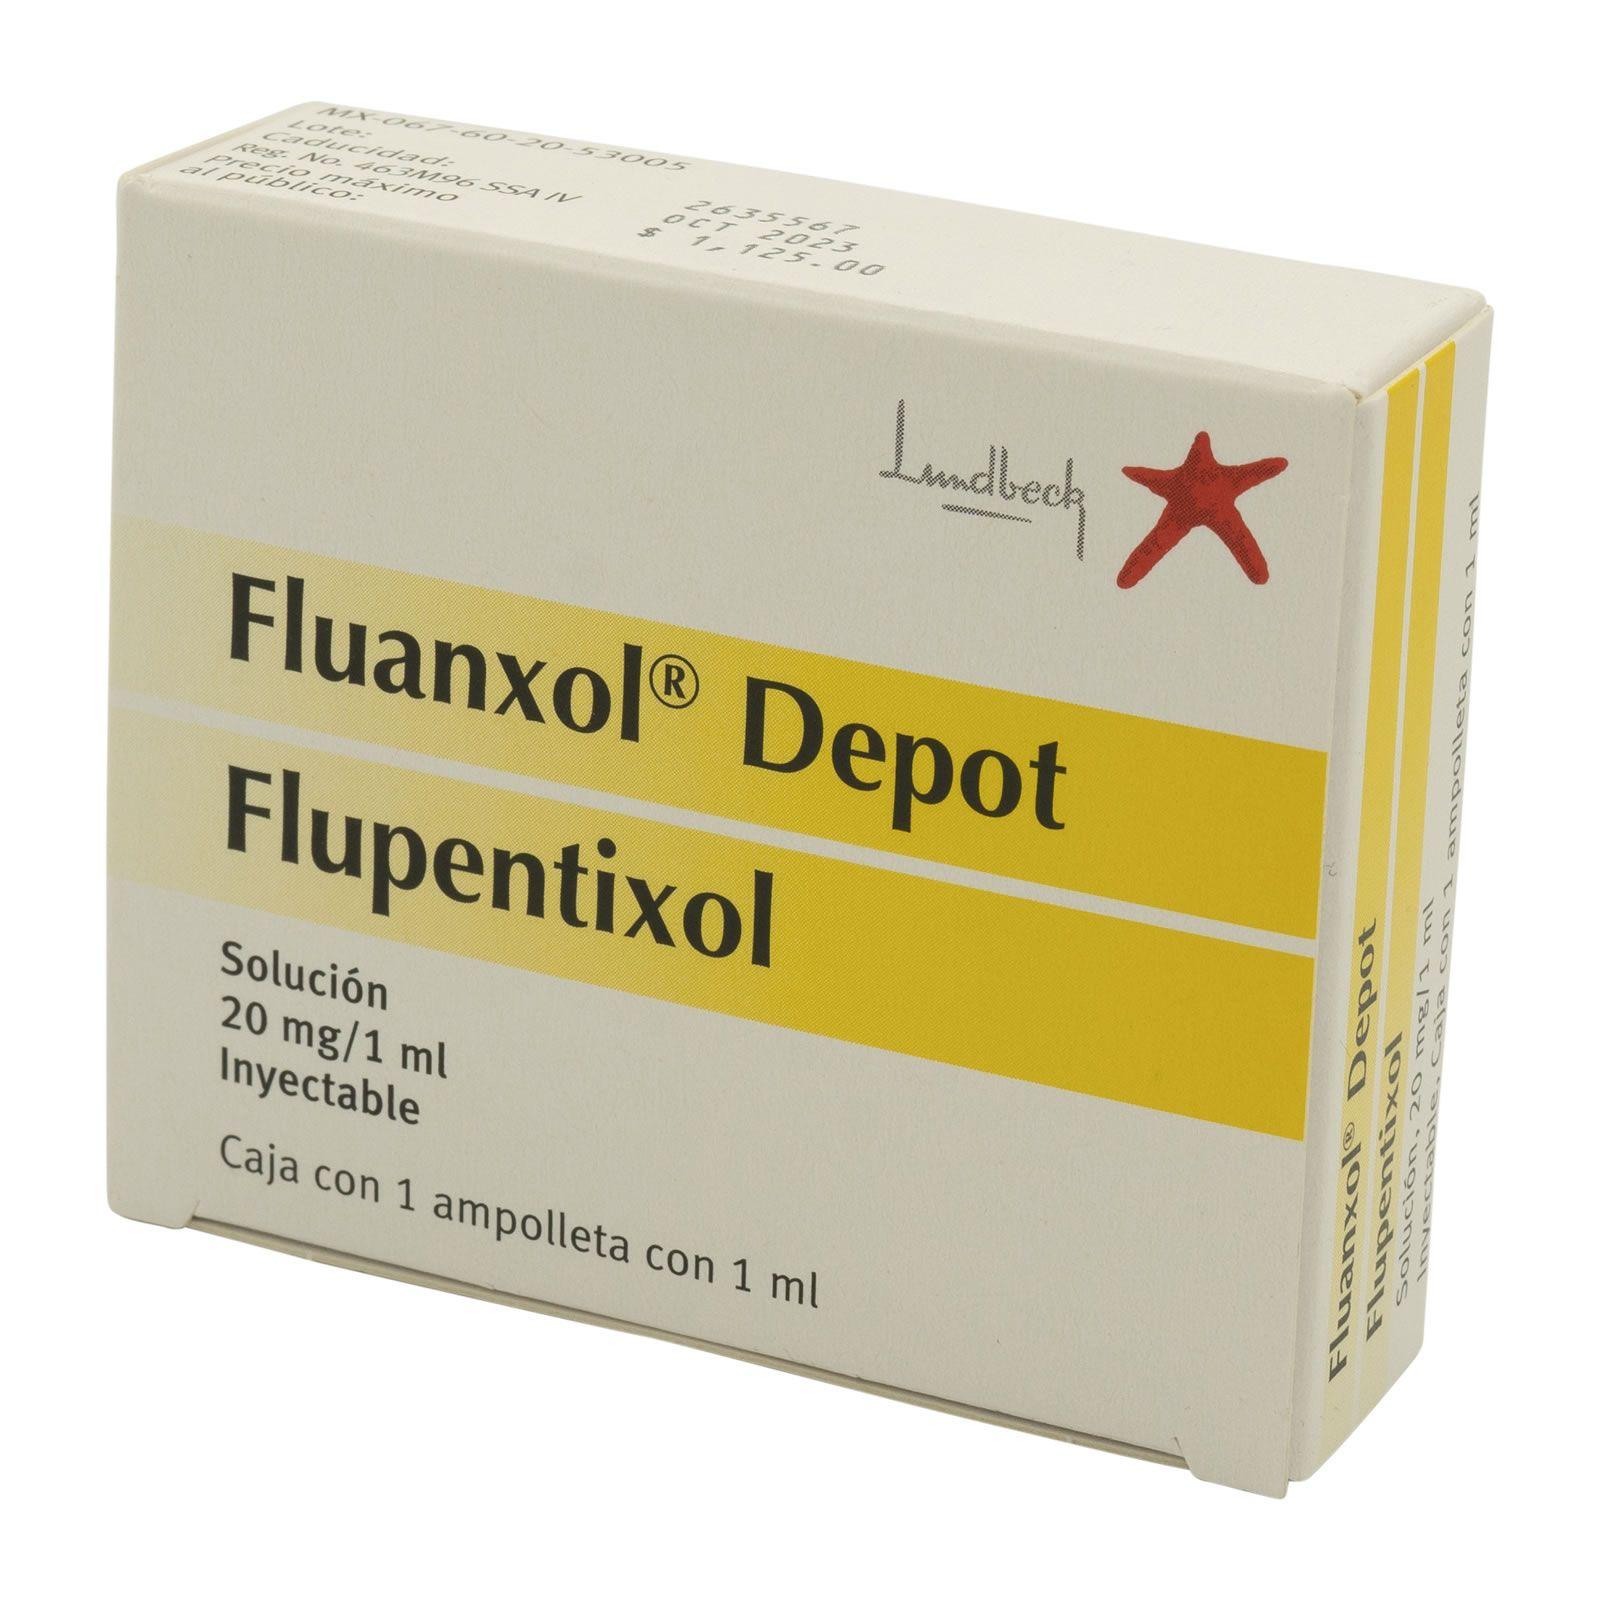 Comprar Fluanxol Depot 20 Mg Caja 1 Ampolleta 1 Ml